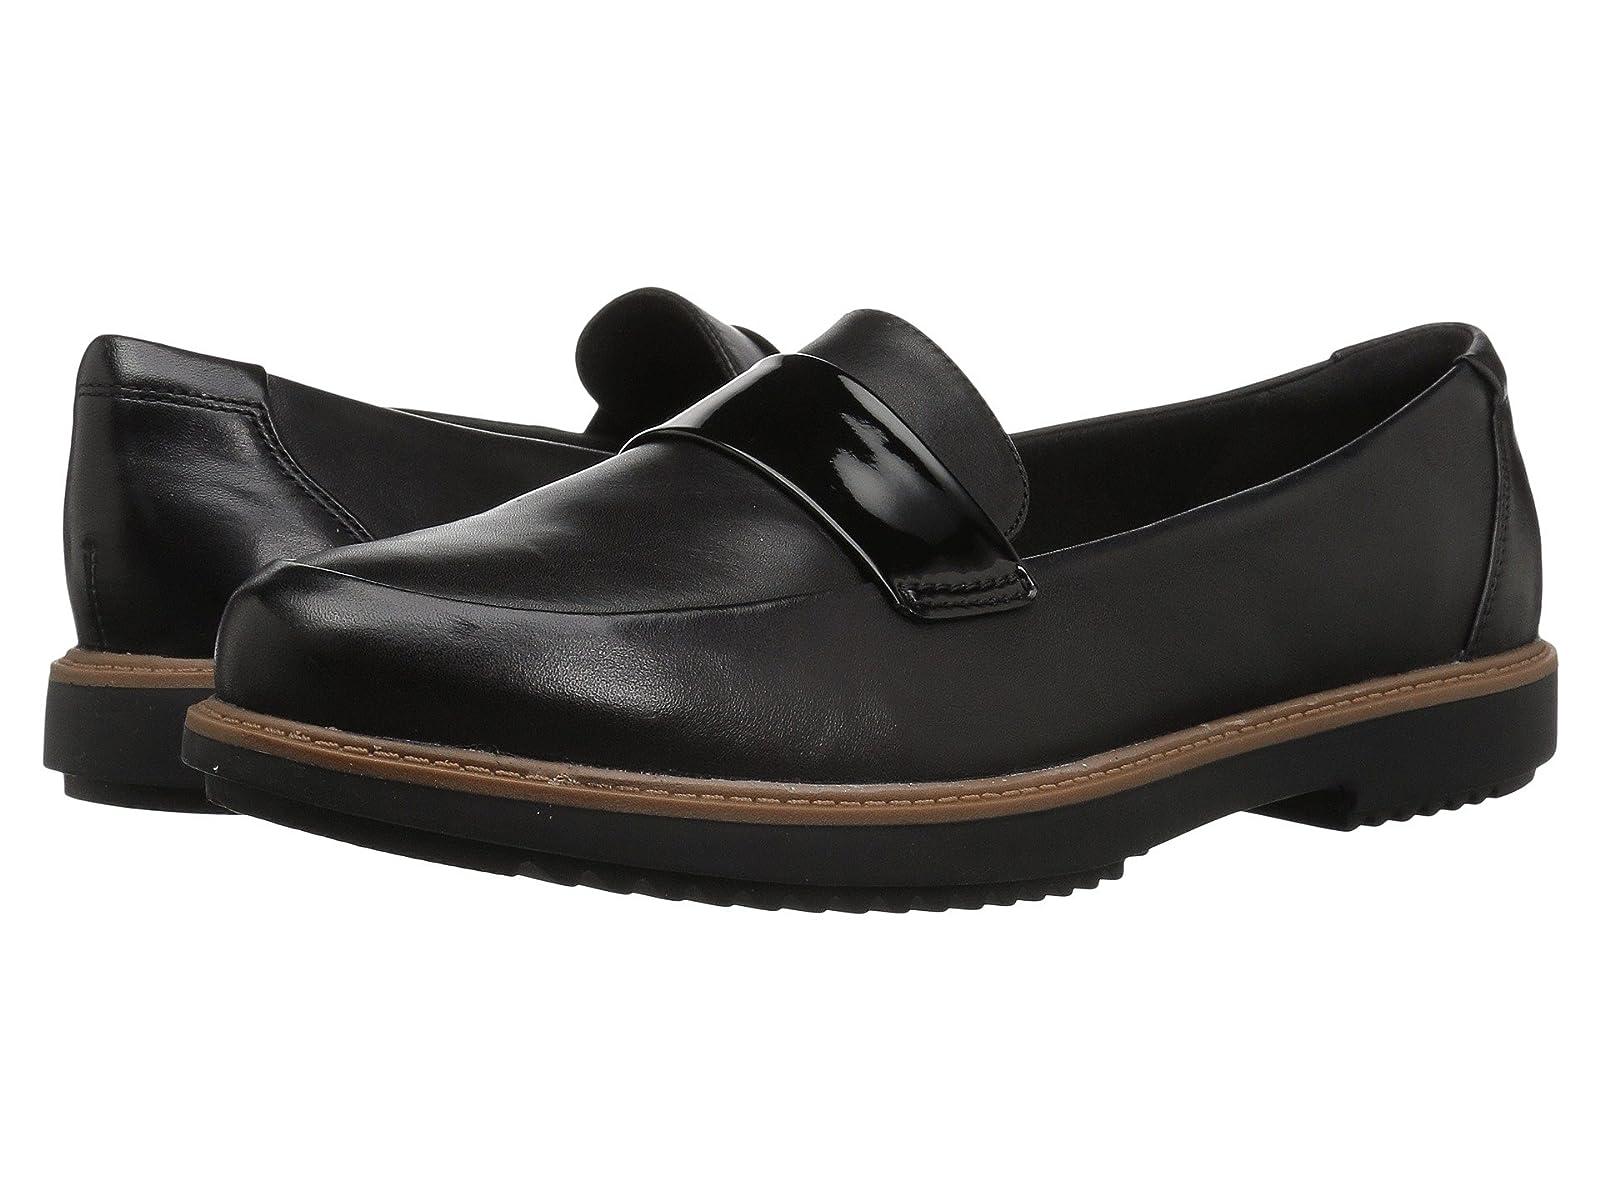 Clarks Raisie ArlieAtmospheric grades have affordable shoes